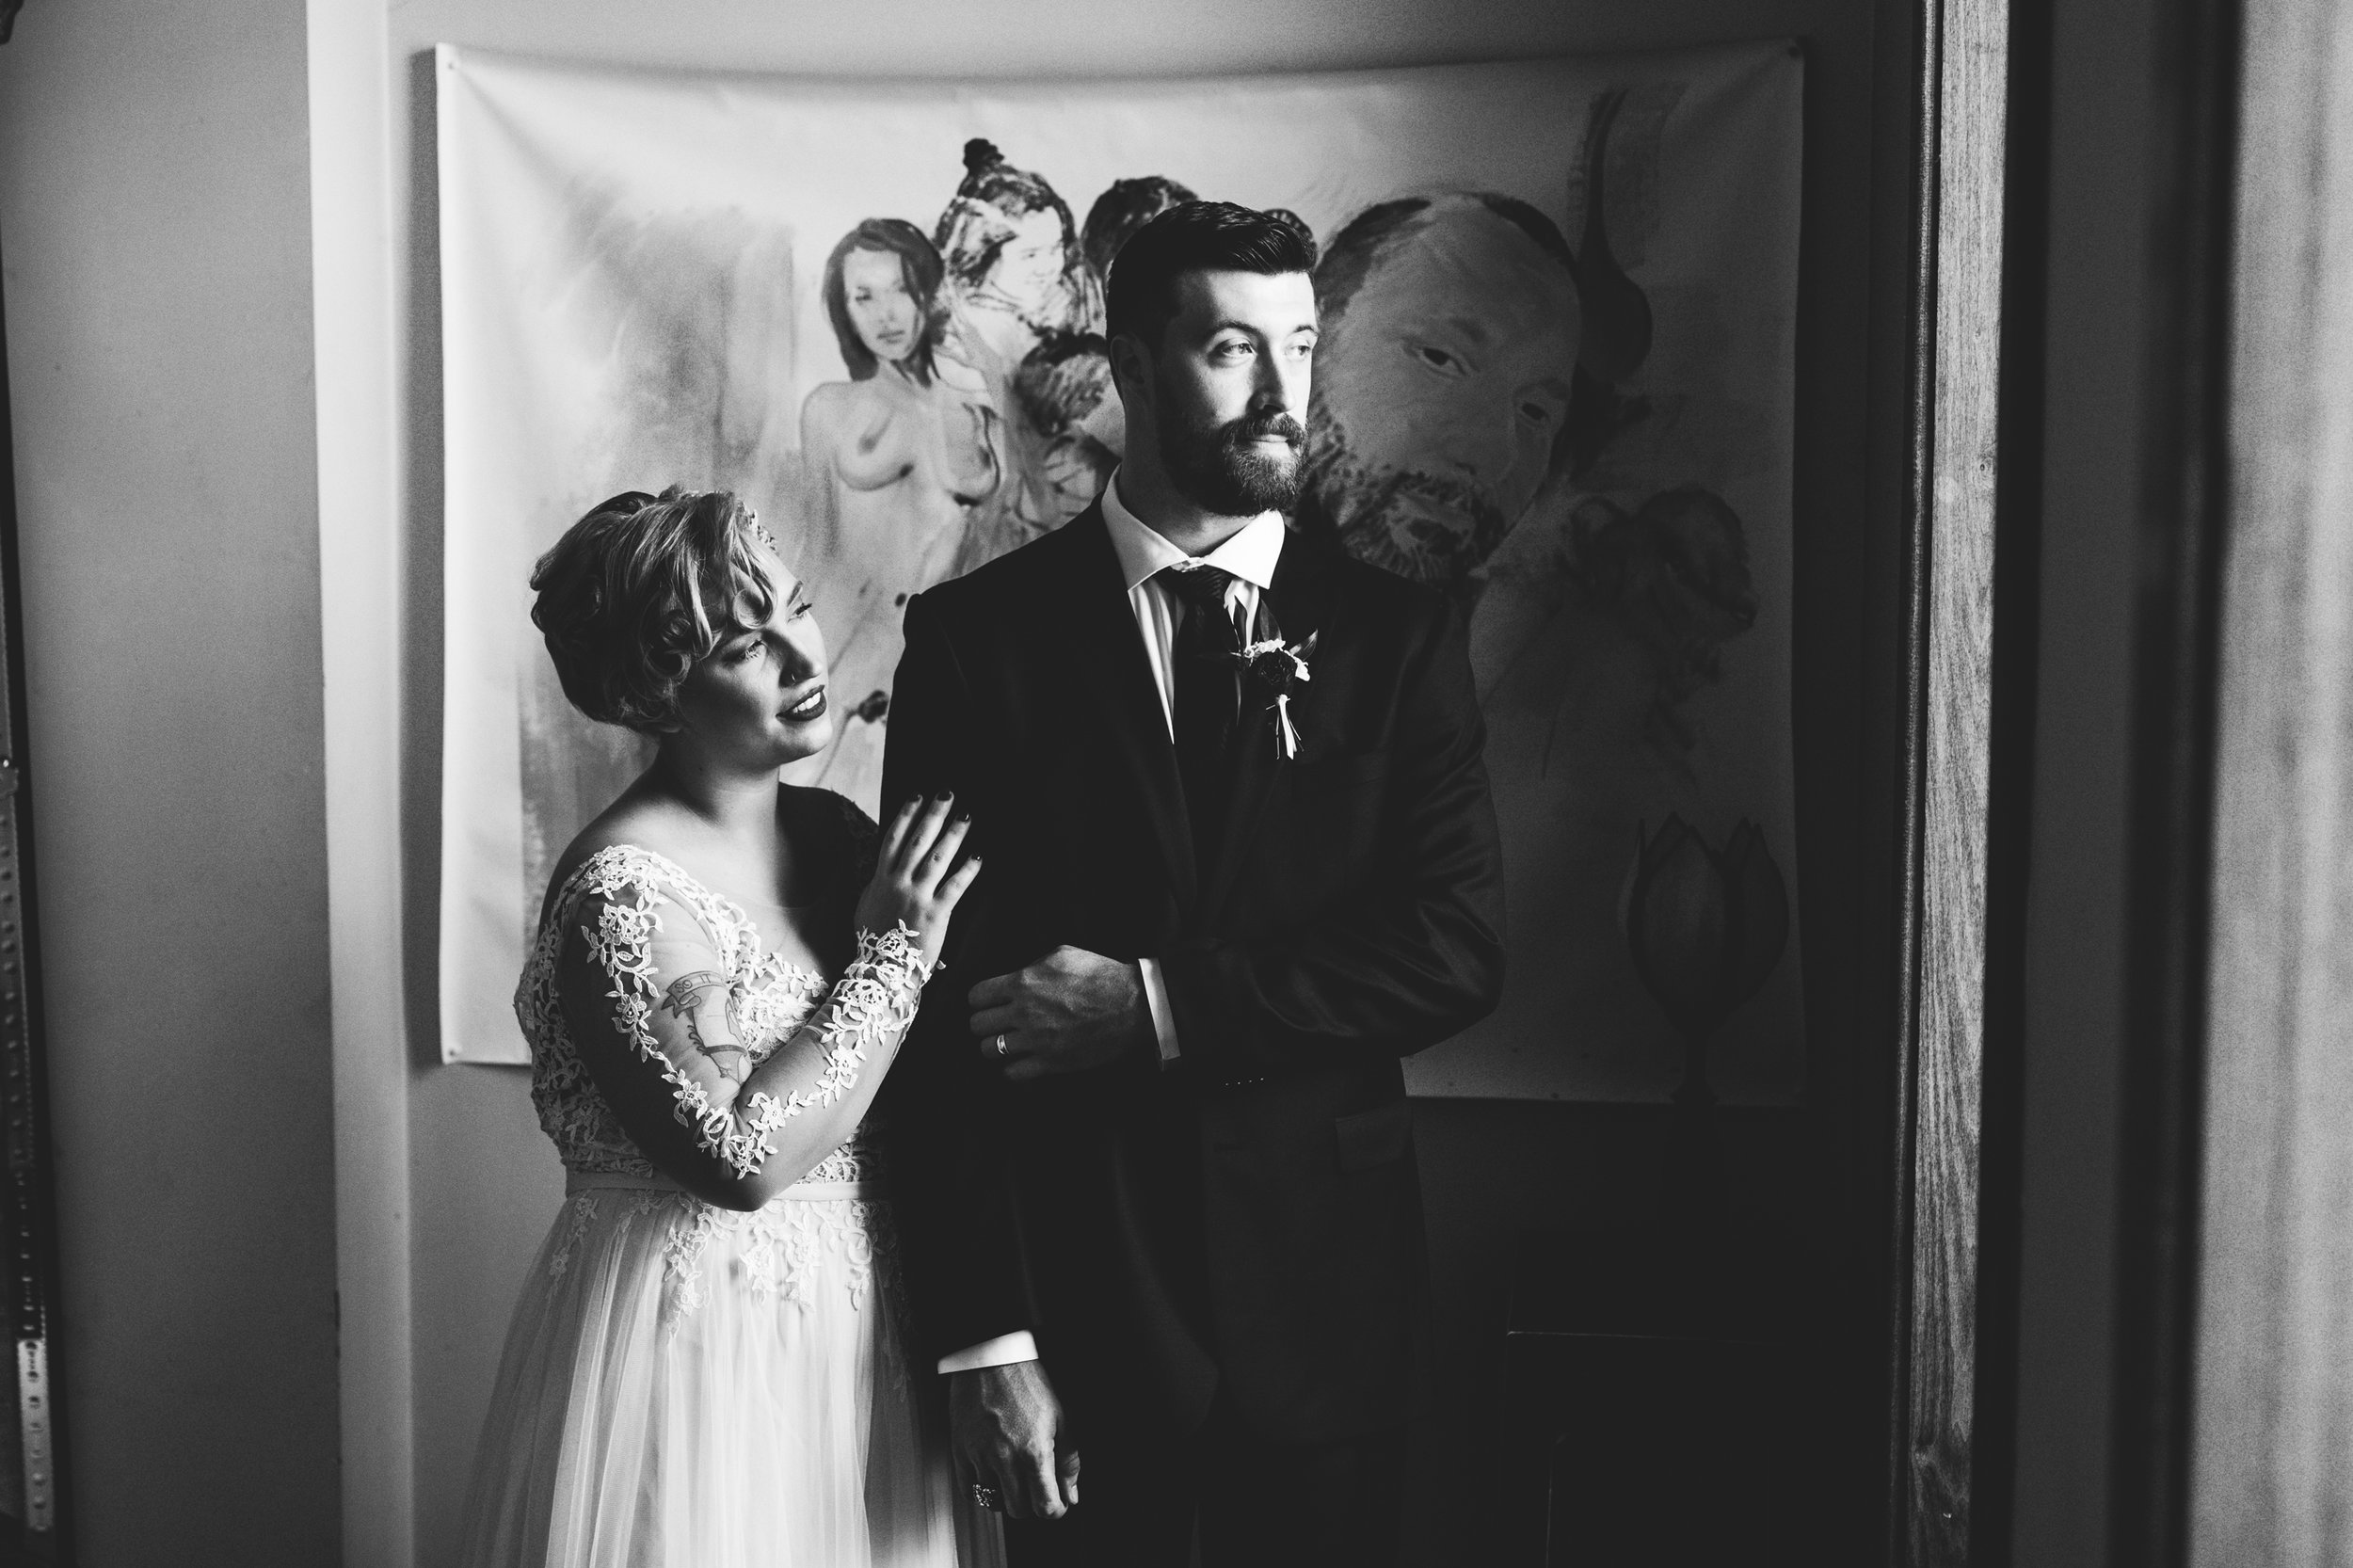 Kentucky Wedding Louisville Wedding Photographer 2018 Crystal Ludwick Photo Louisville Wedding Photographer Kentucky Wedding Photographer (4 of 105).jpg